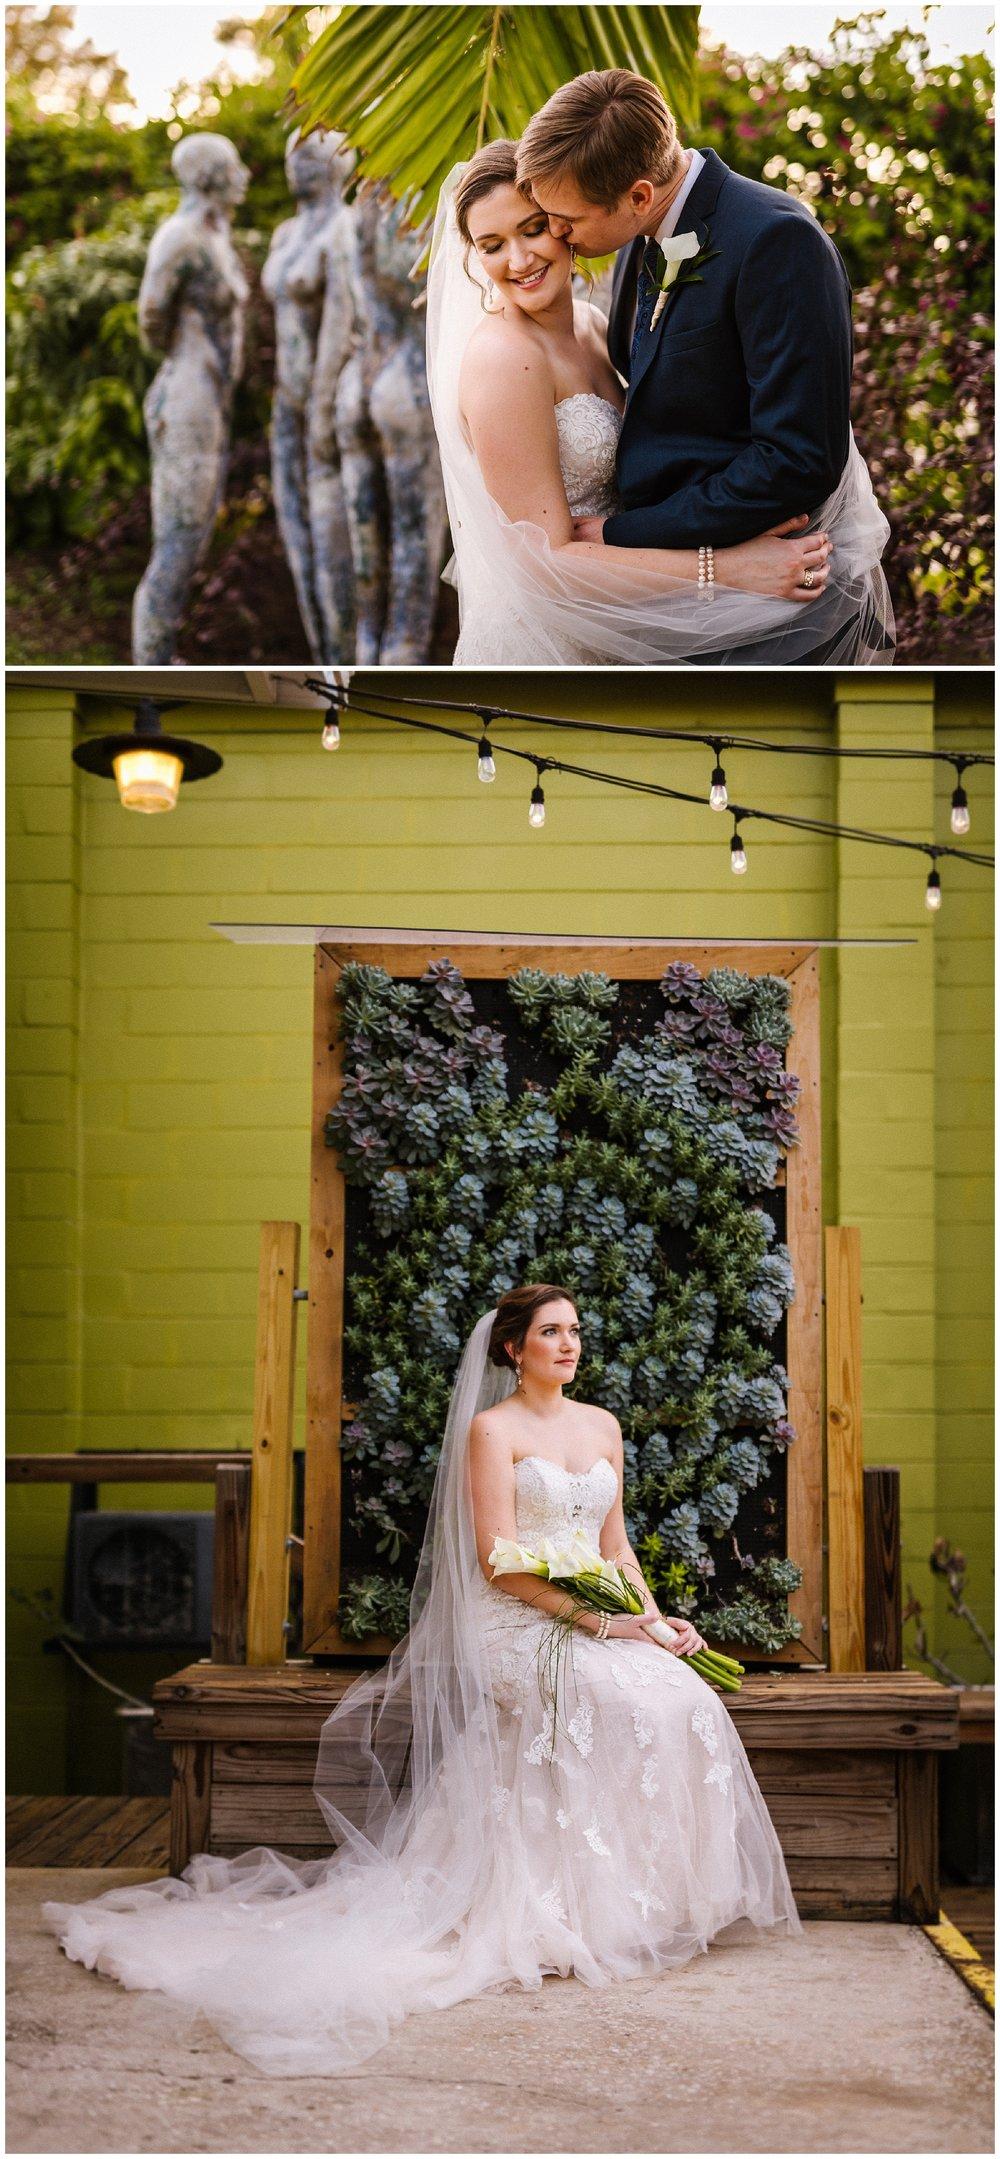 St-pete-wedding-photography-unique-glass-blowing-gallery-succulent-art_0021.jpg